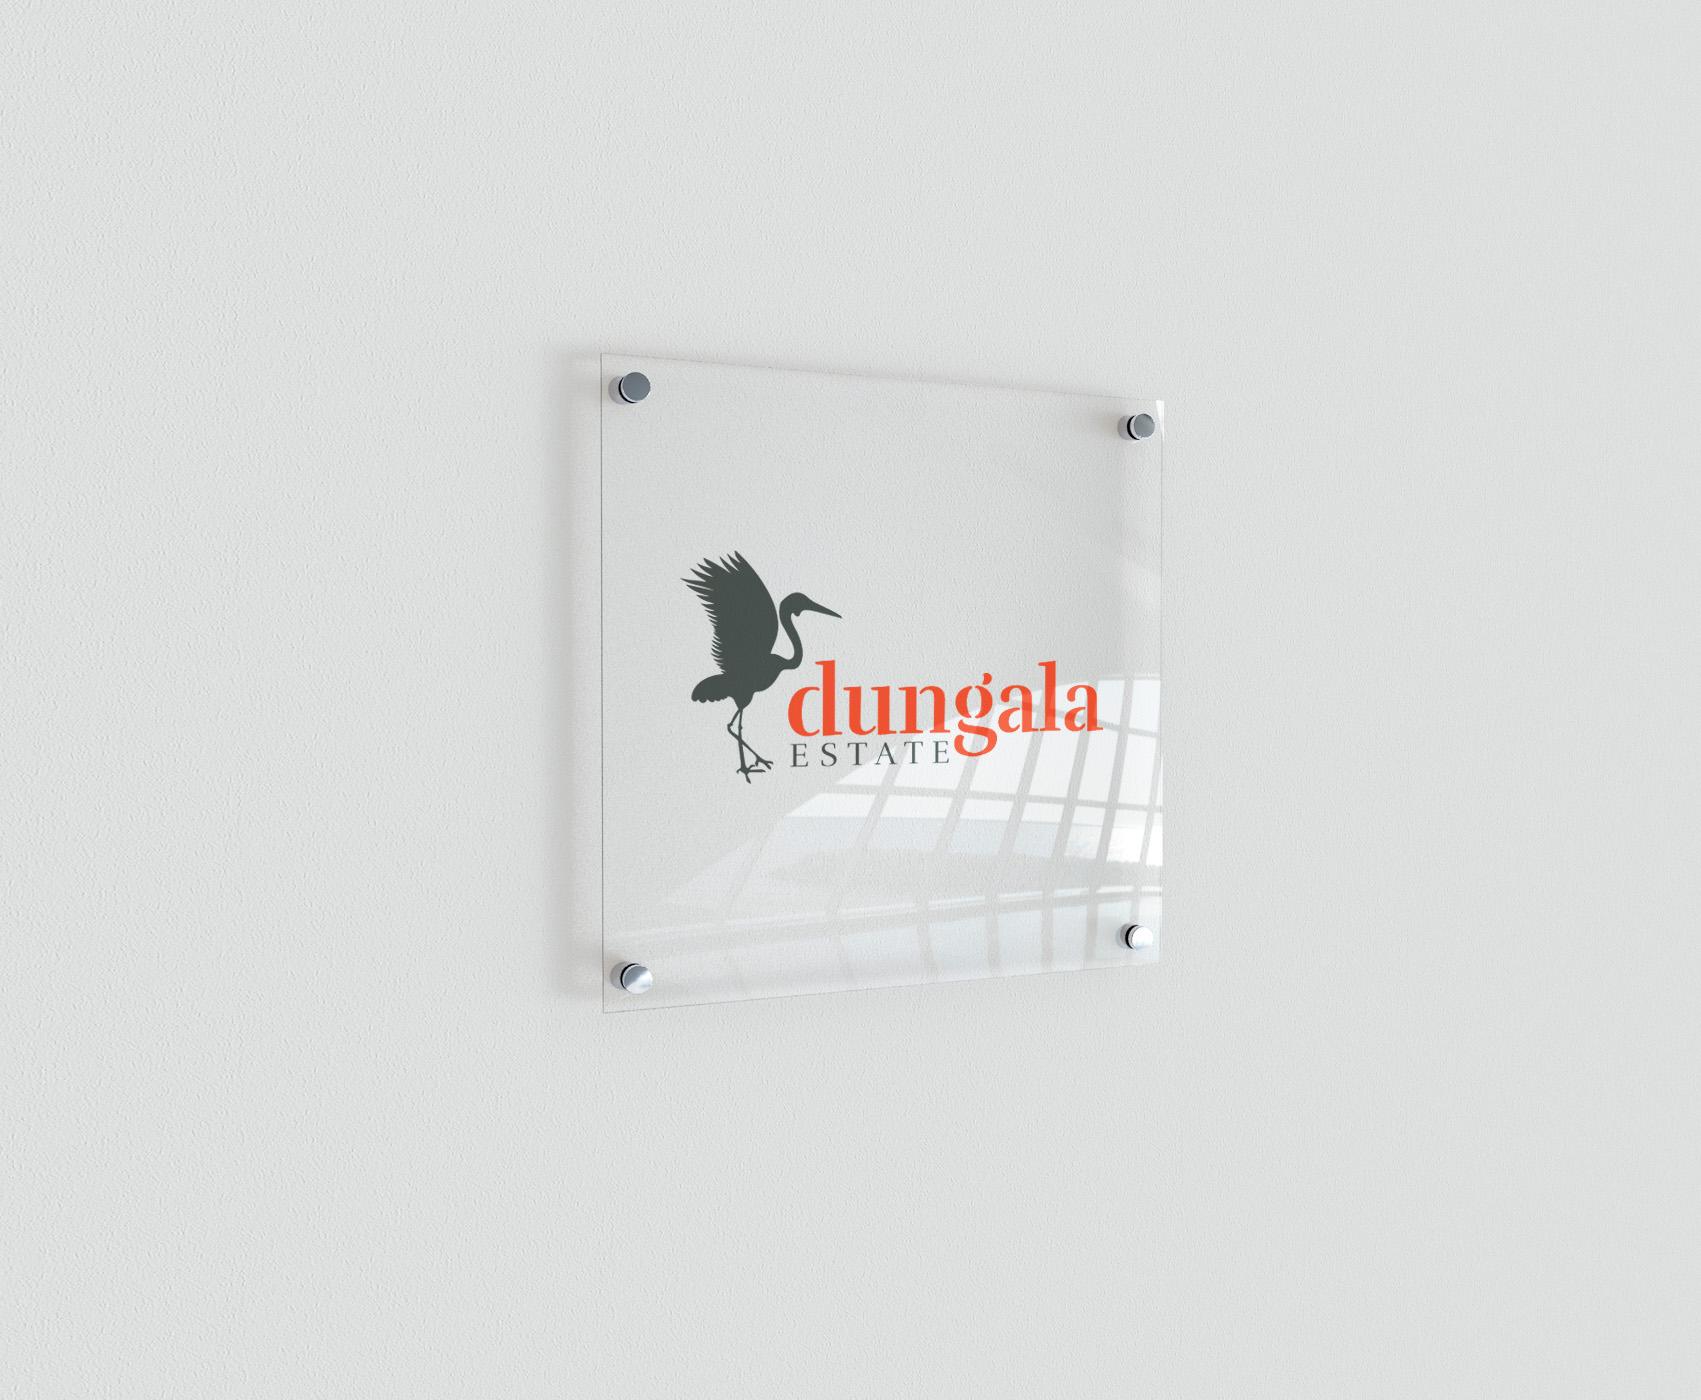 dungala estate sign